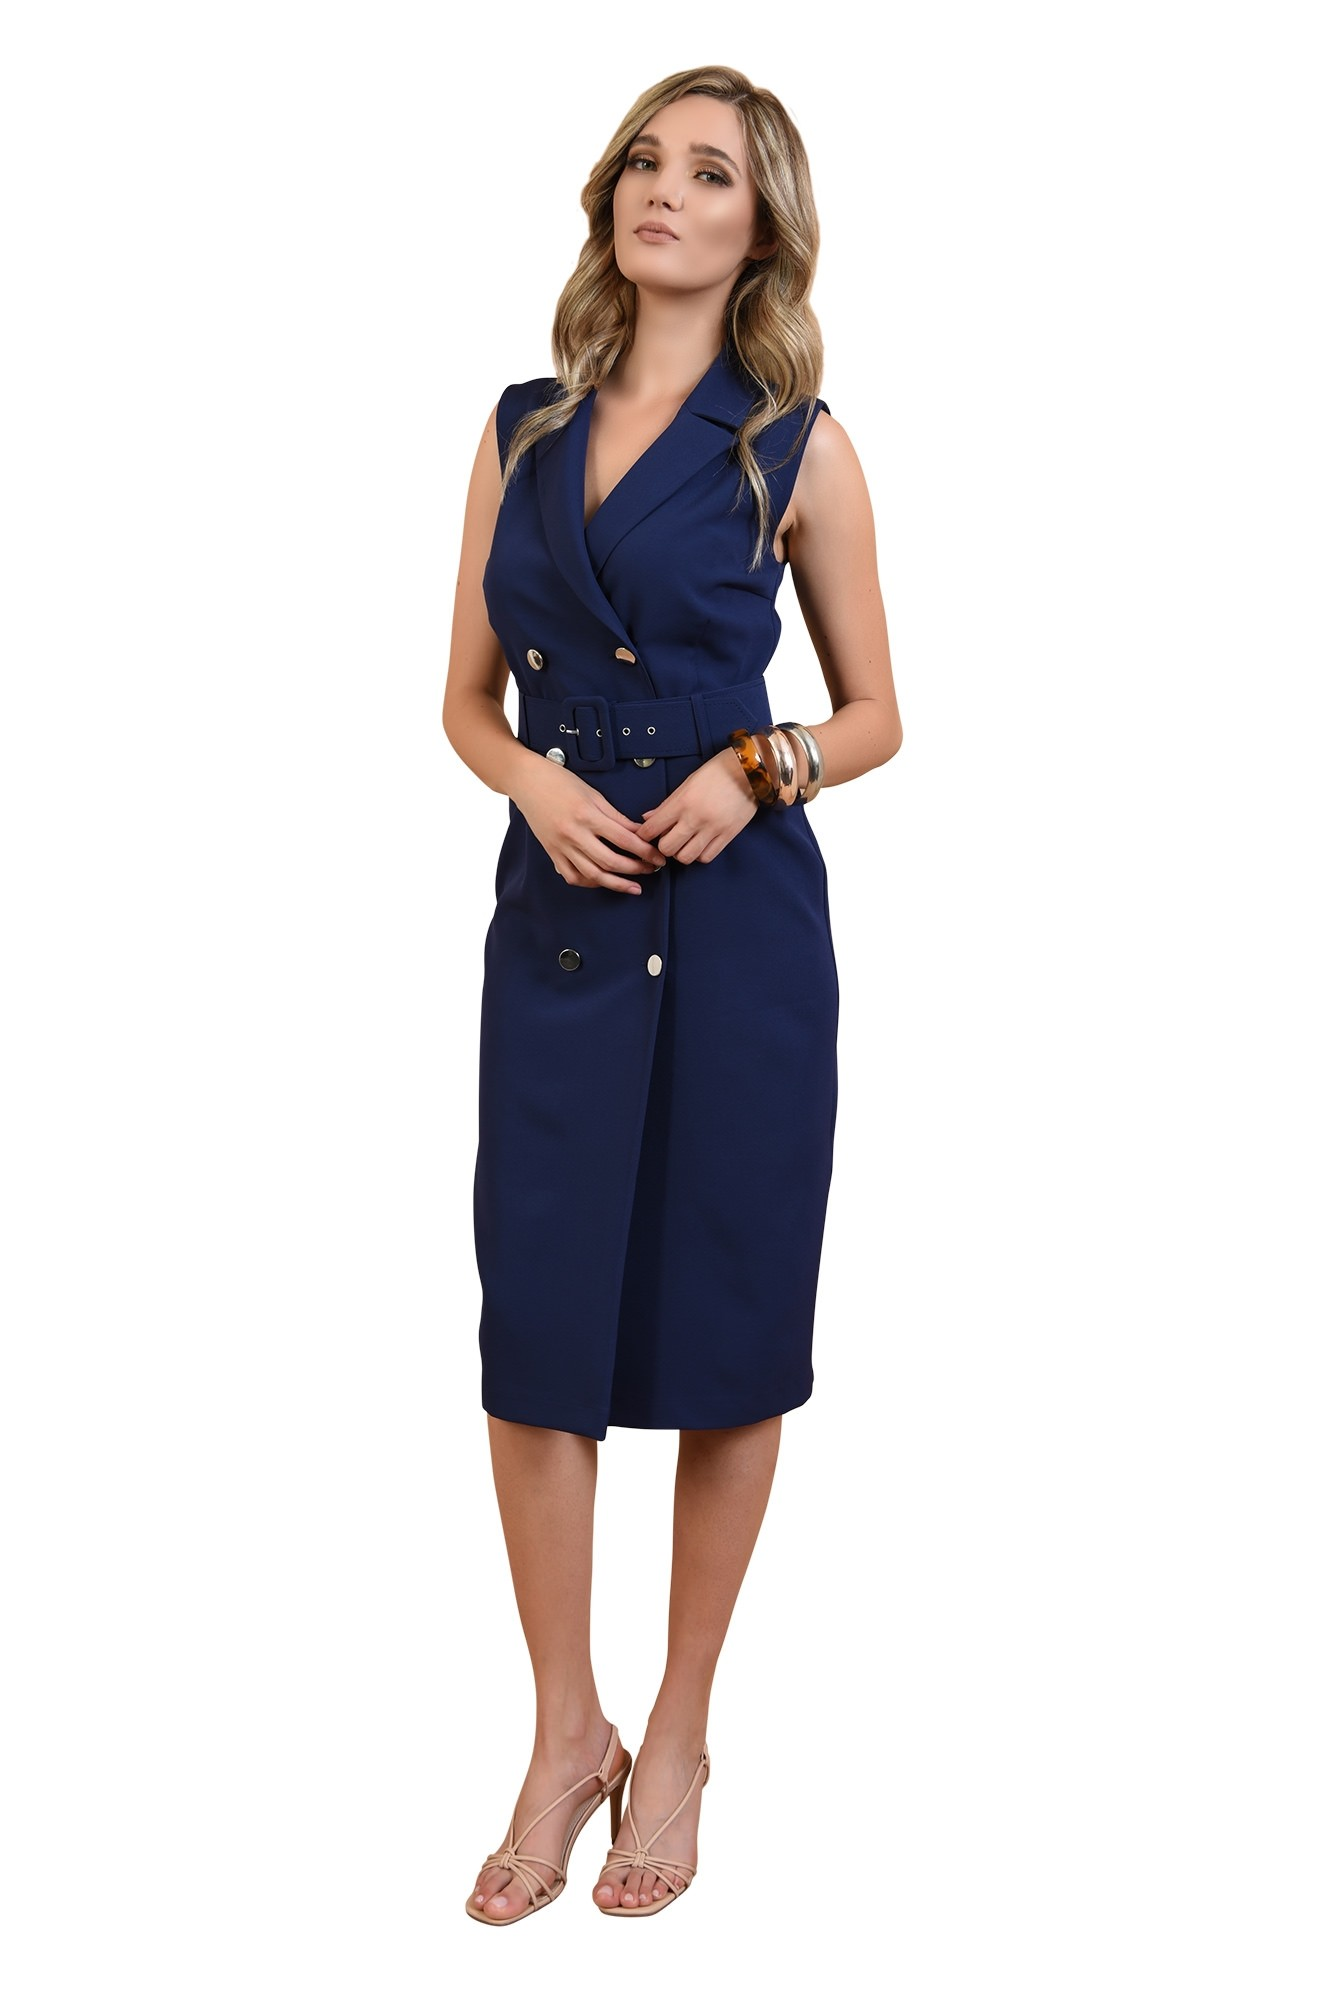 360 - rochie conica, bleumarin, cu nasturi, stil sacou, Poema